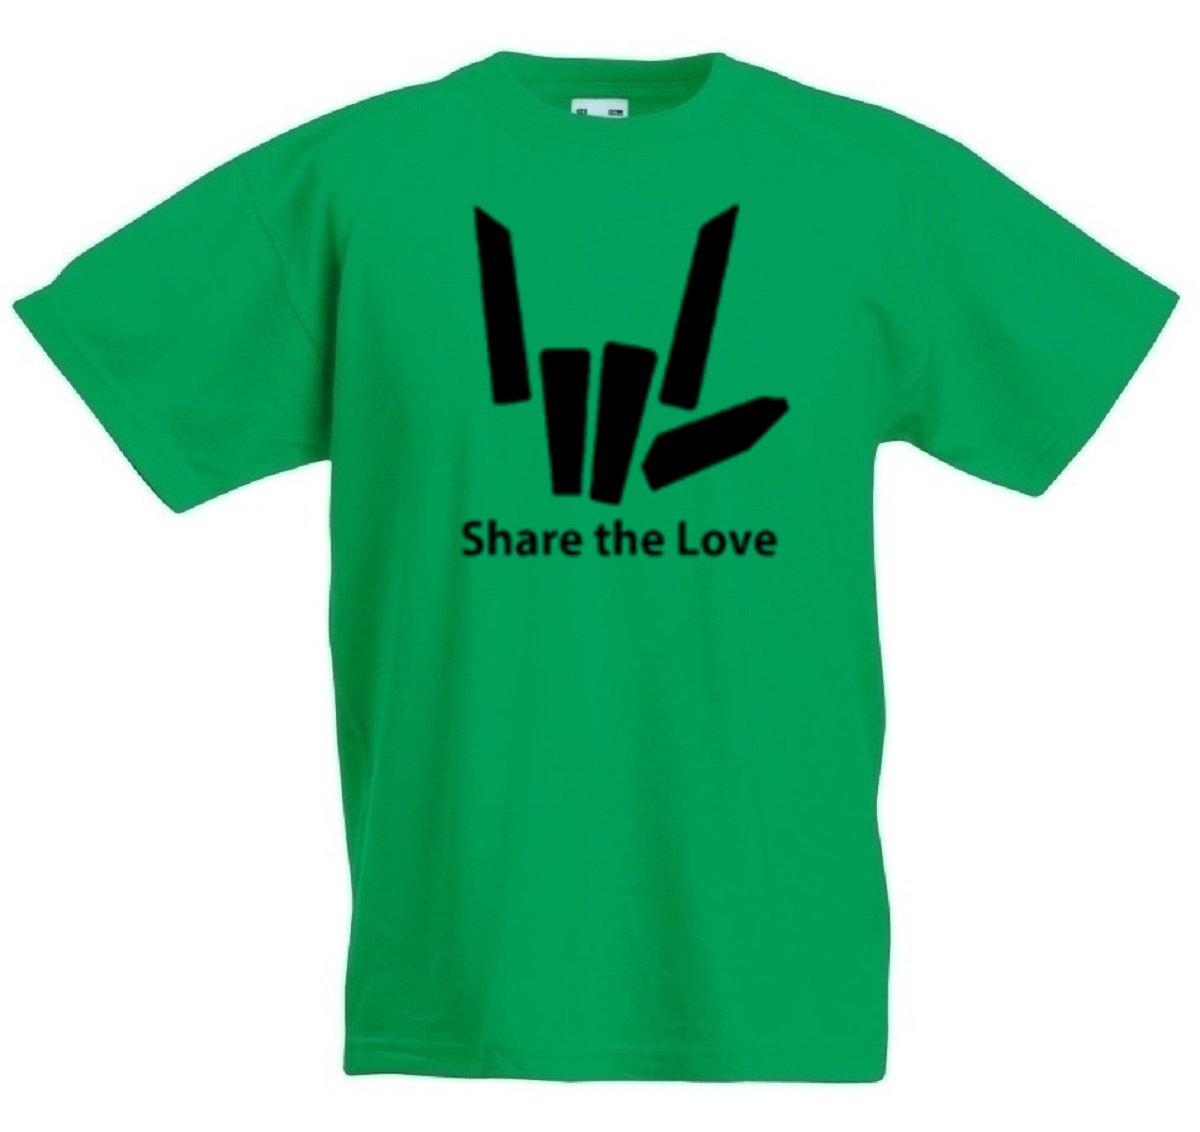 Share The Love Black Logo T-Shirt, Cotton,100% Cotton, Men's, Women, Kids Men' s